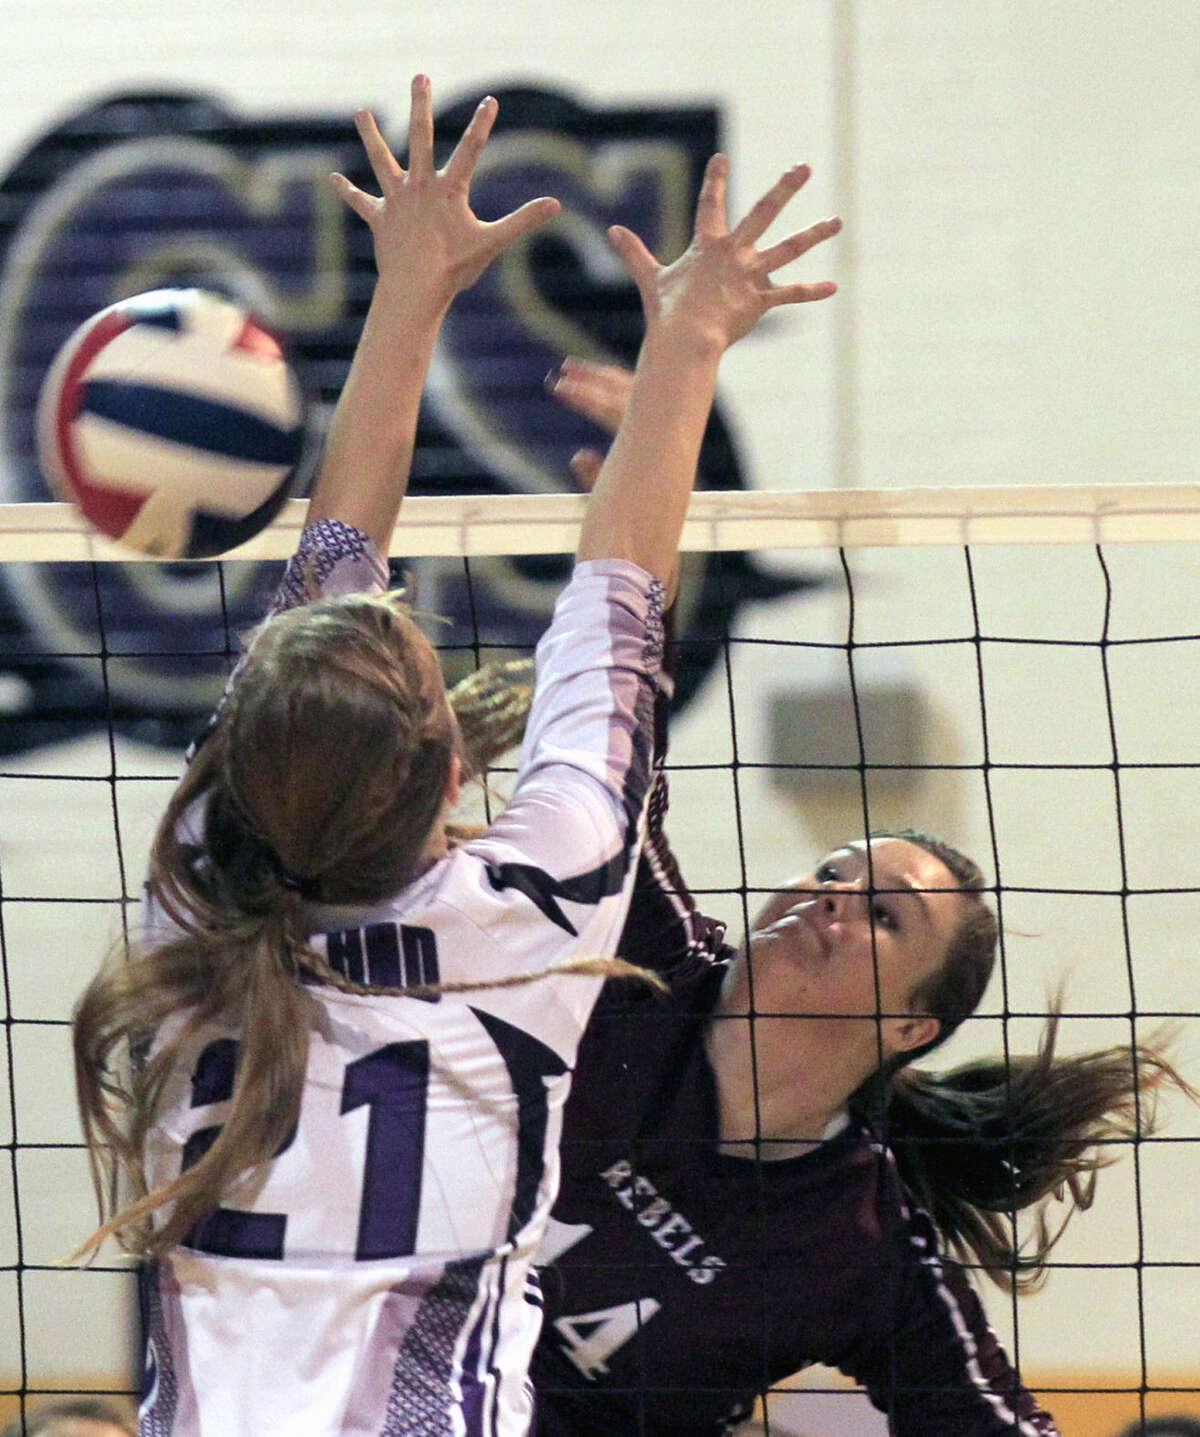 Lee's Darby O'Grady (14) hits past Midland High's Krista Epley (21) last season at MHS. James Durbin/Reporter-Telegram